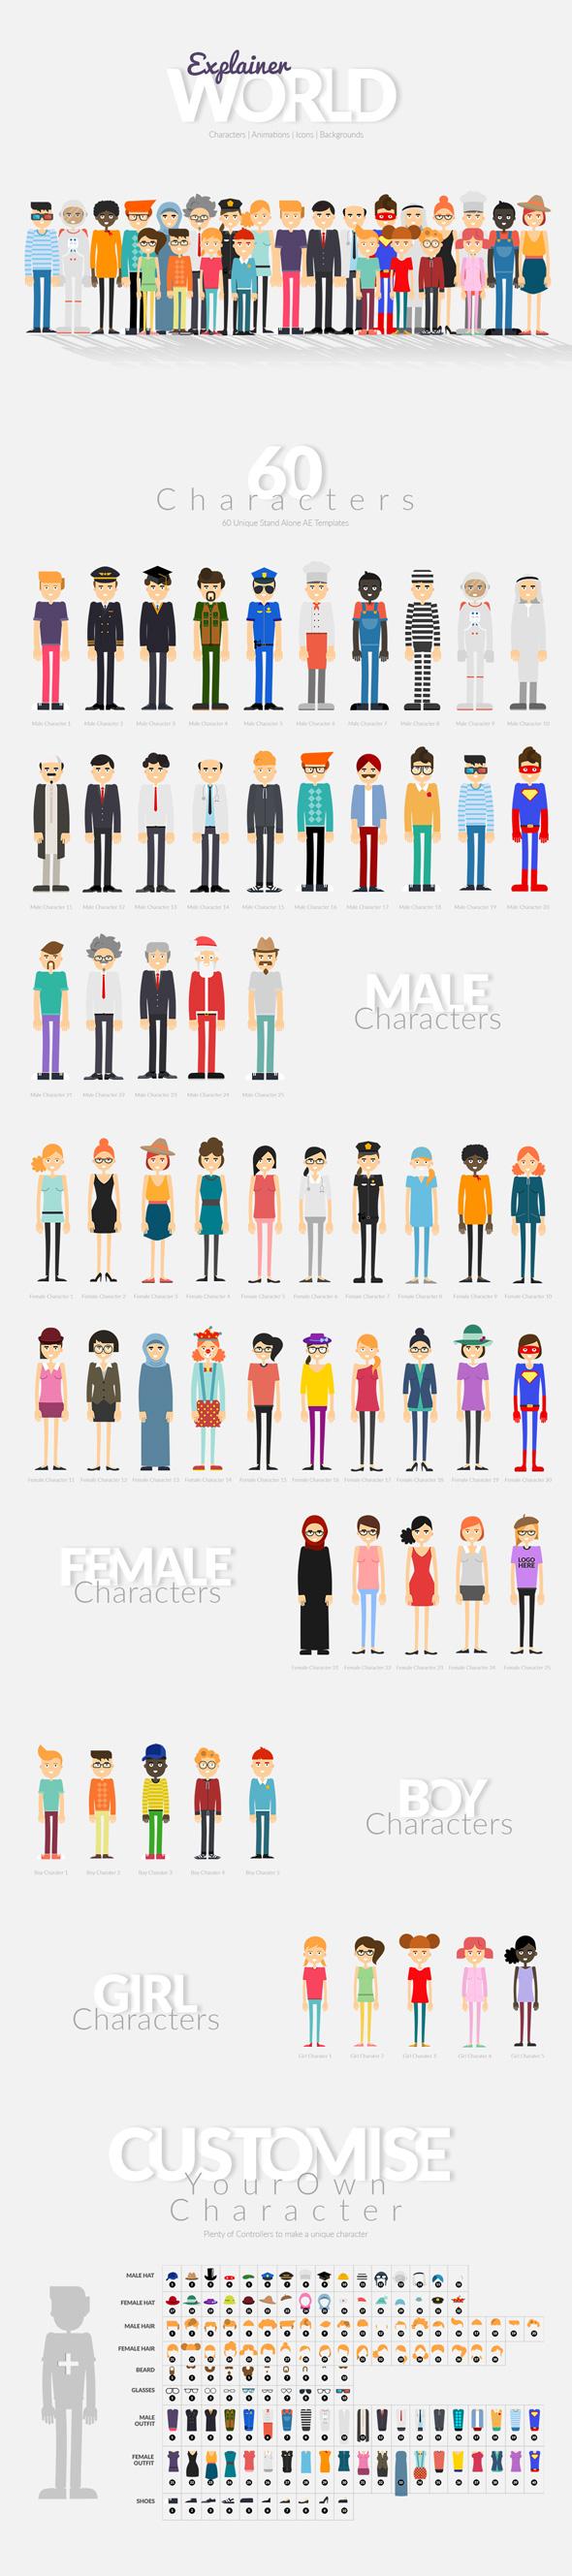 PremiumBuilder Characters - 17